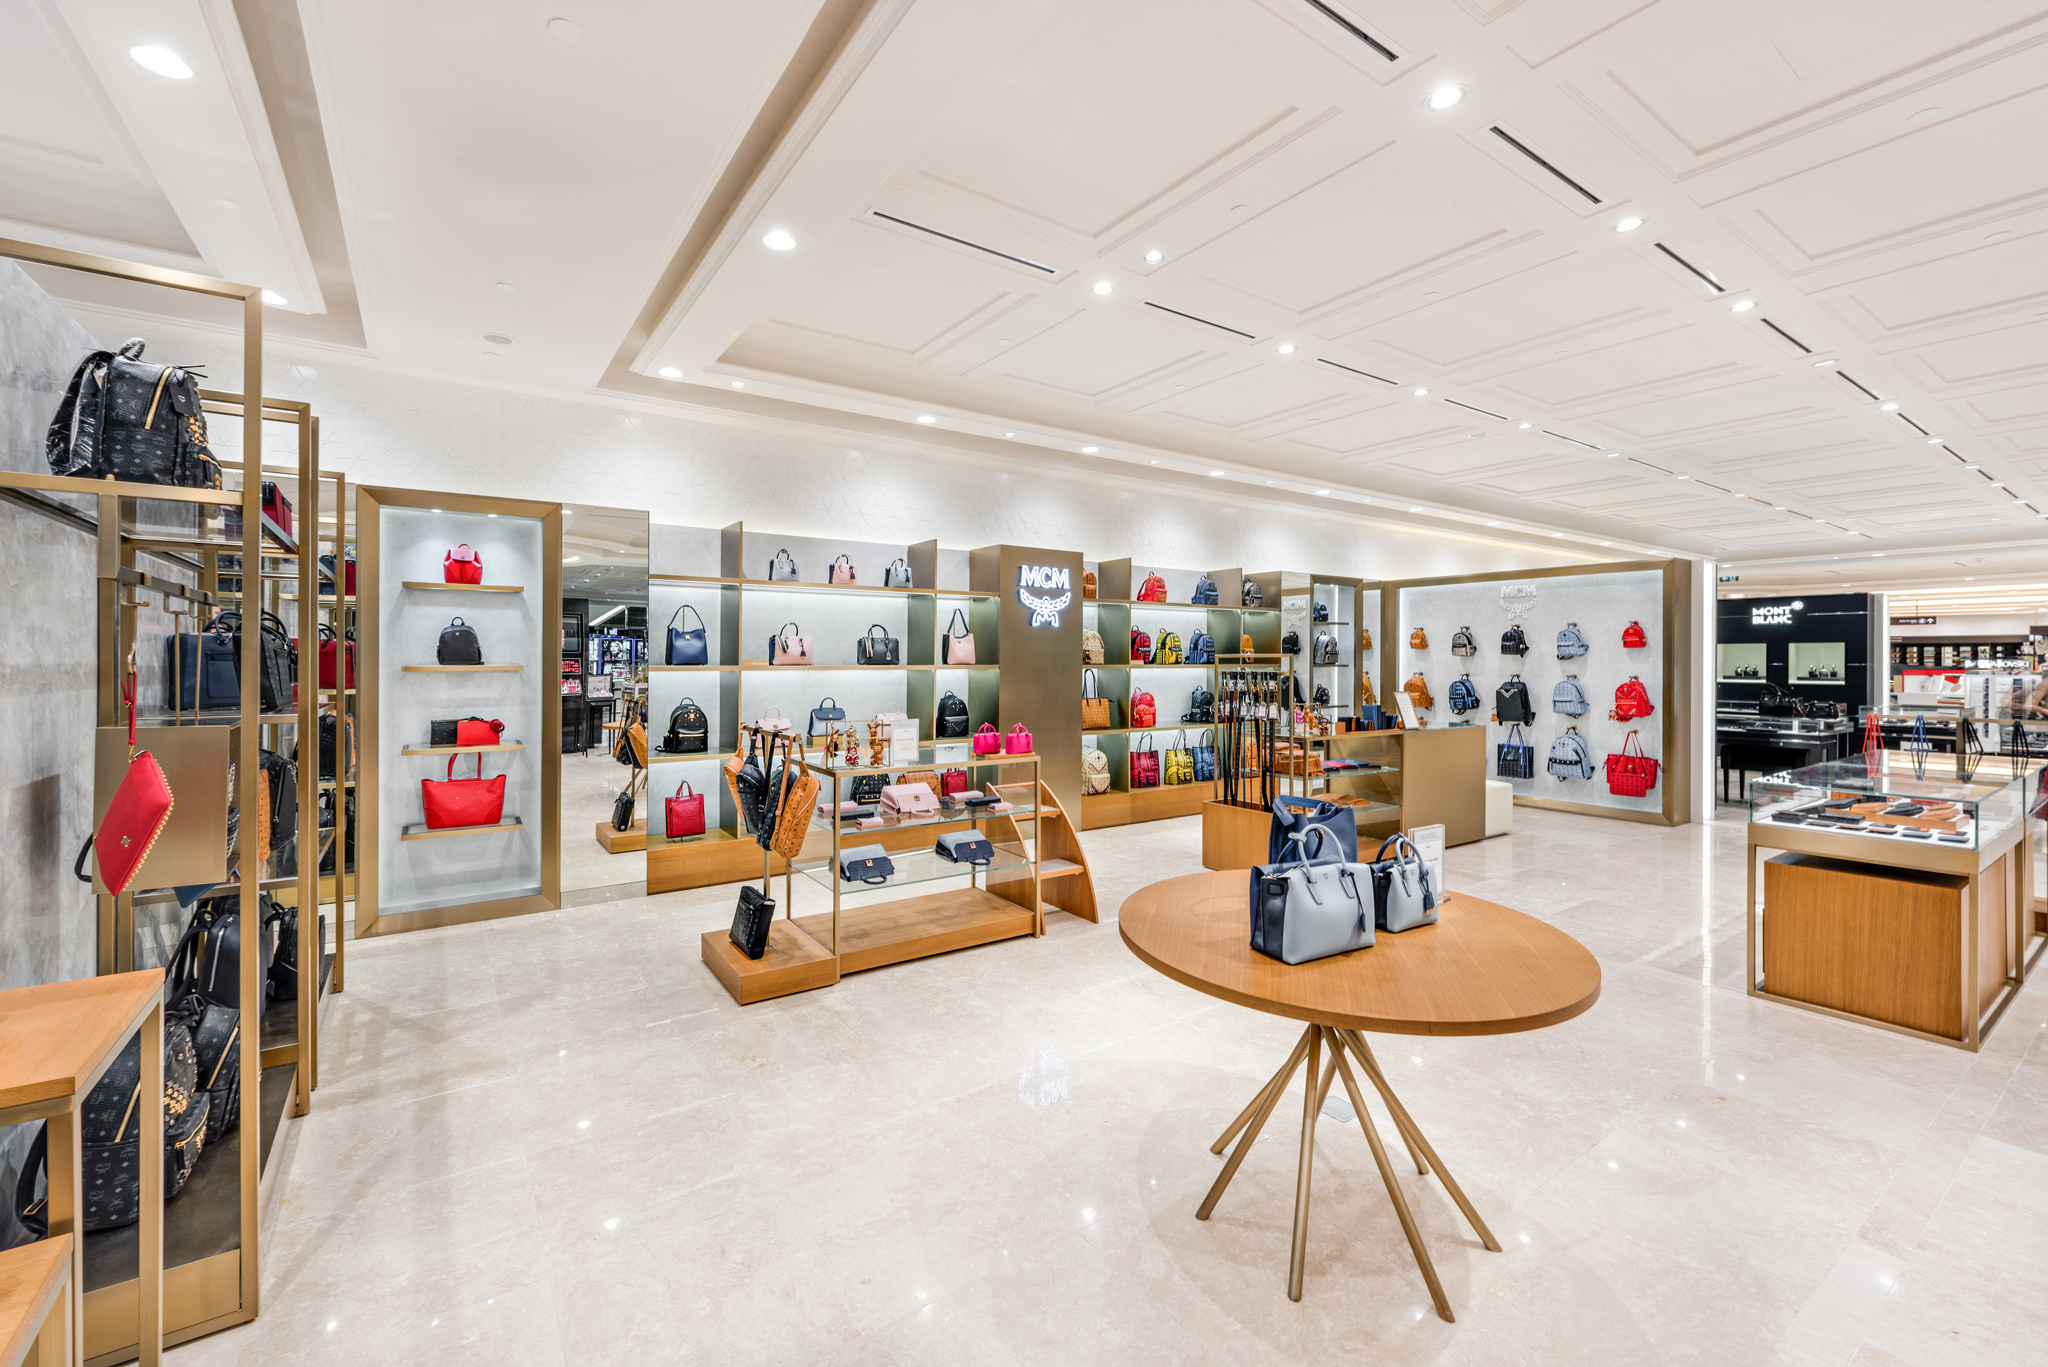 20160729 - MCM - HCM - Commercial - Interior - Store - Retouch 0002.jpg